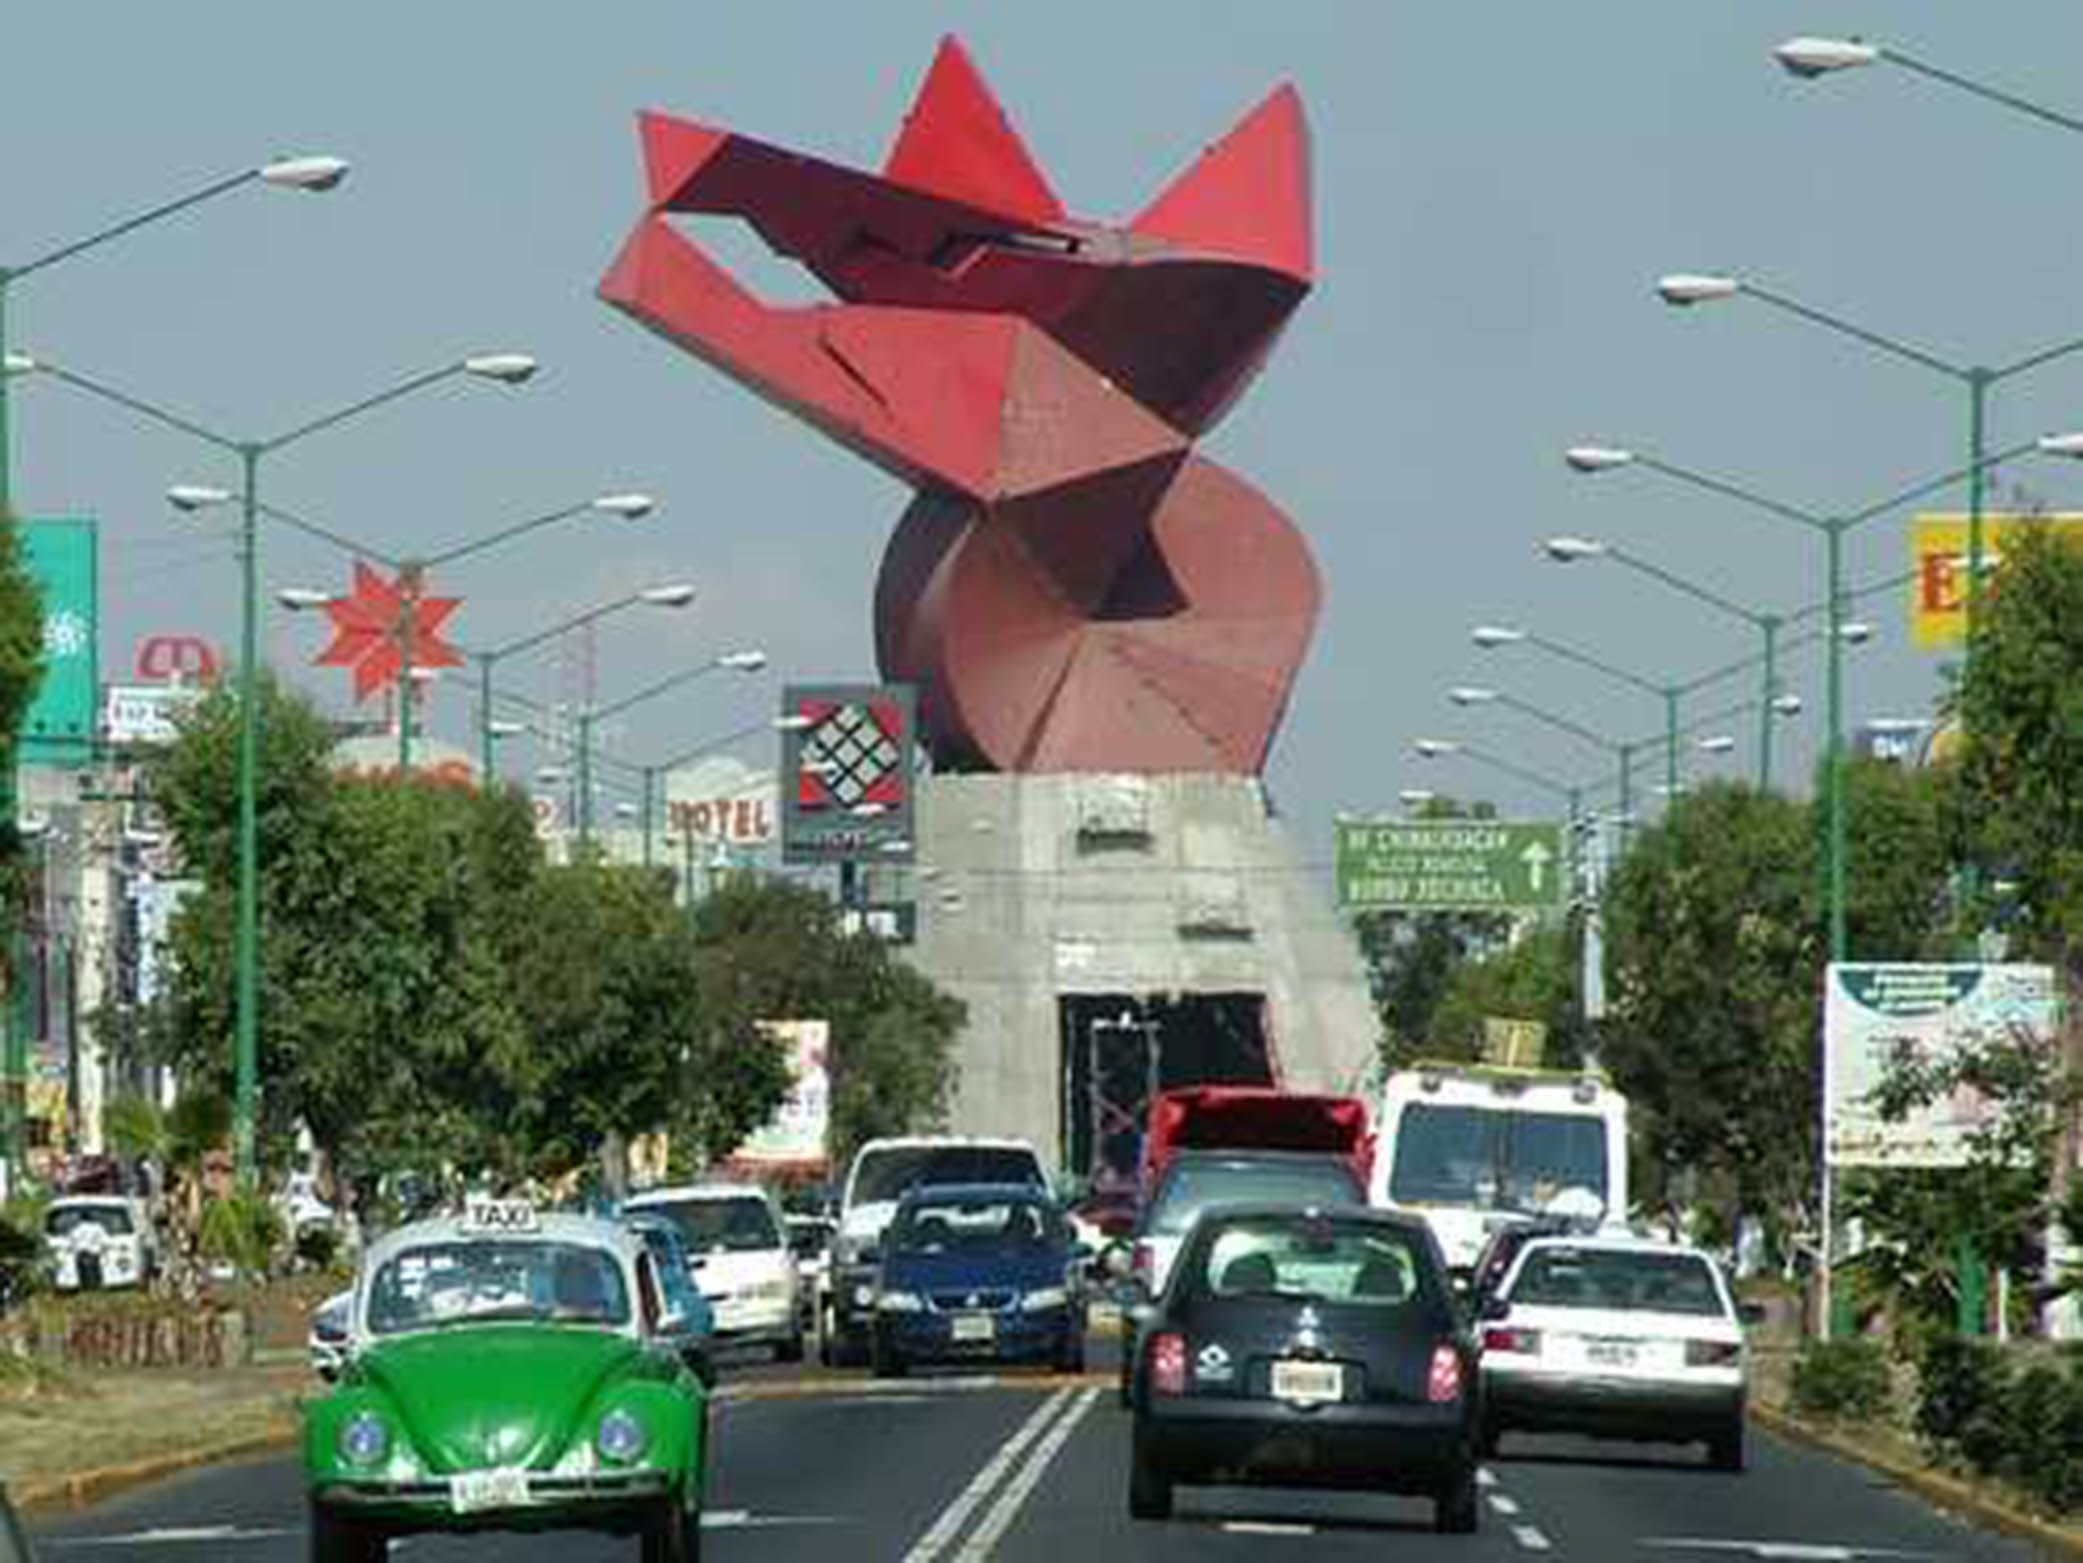 Ciudad nezahualc yotl econ micamente consolidada quadrat n for Cd jardin nezahualcoyotl